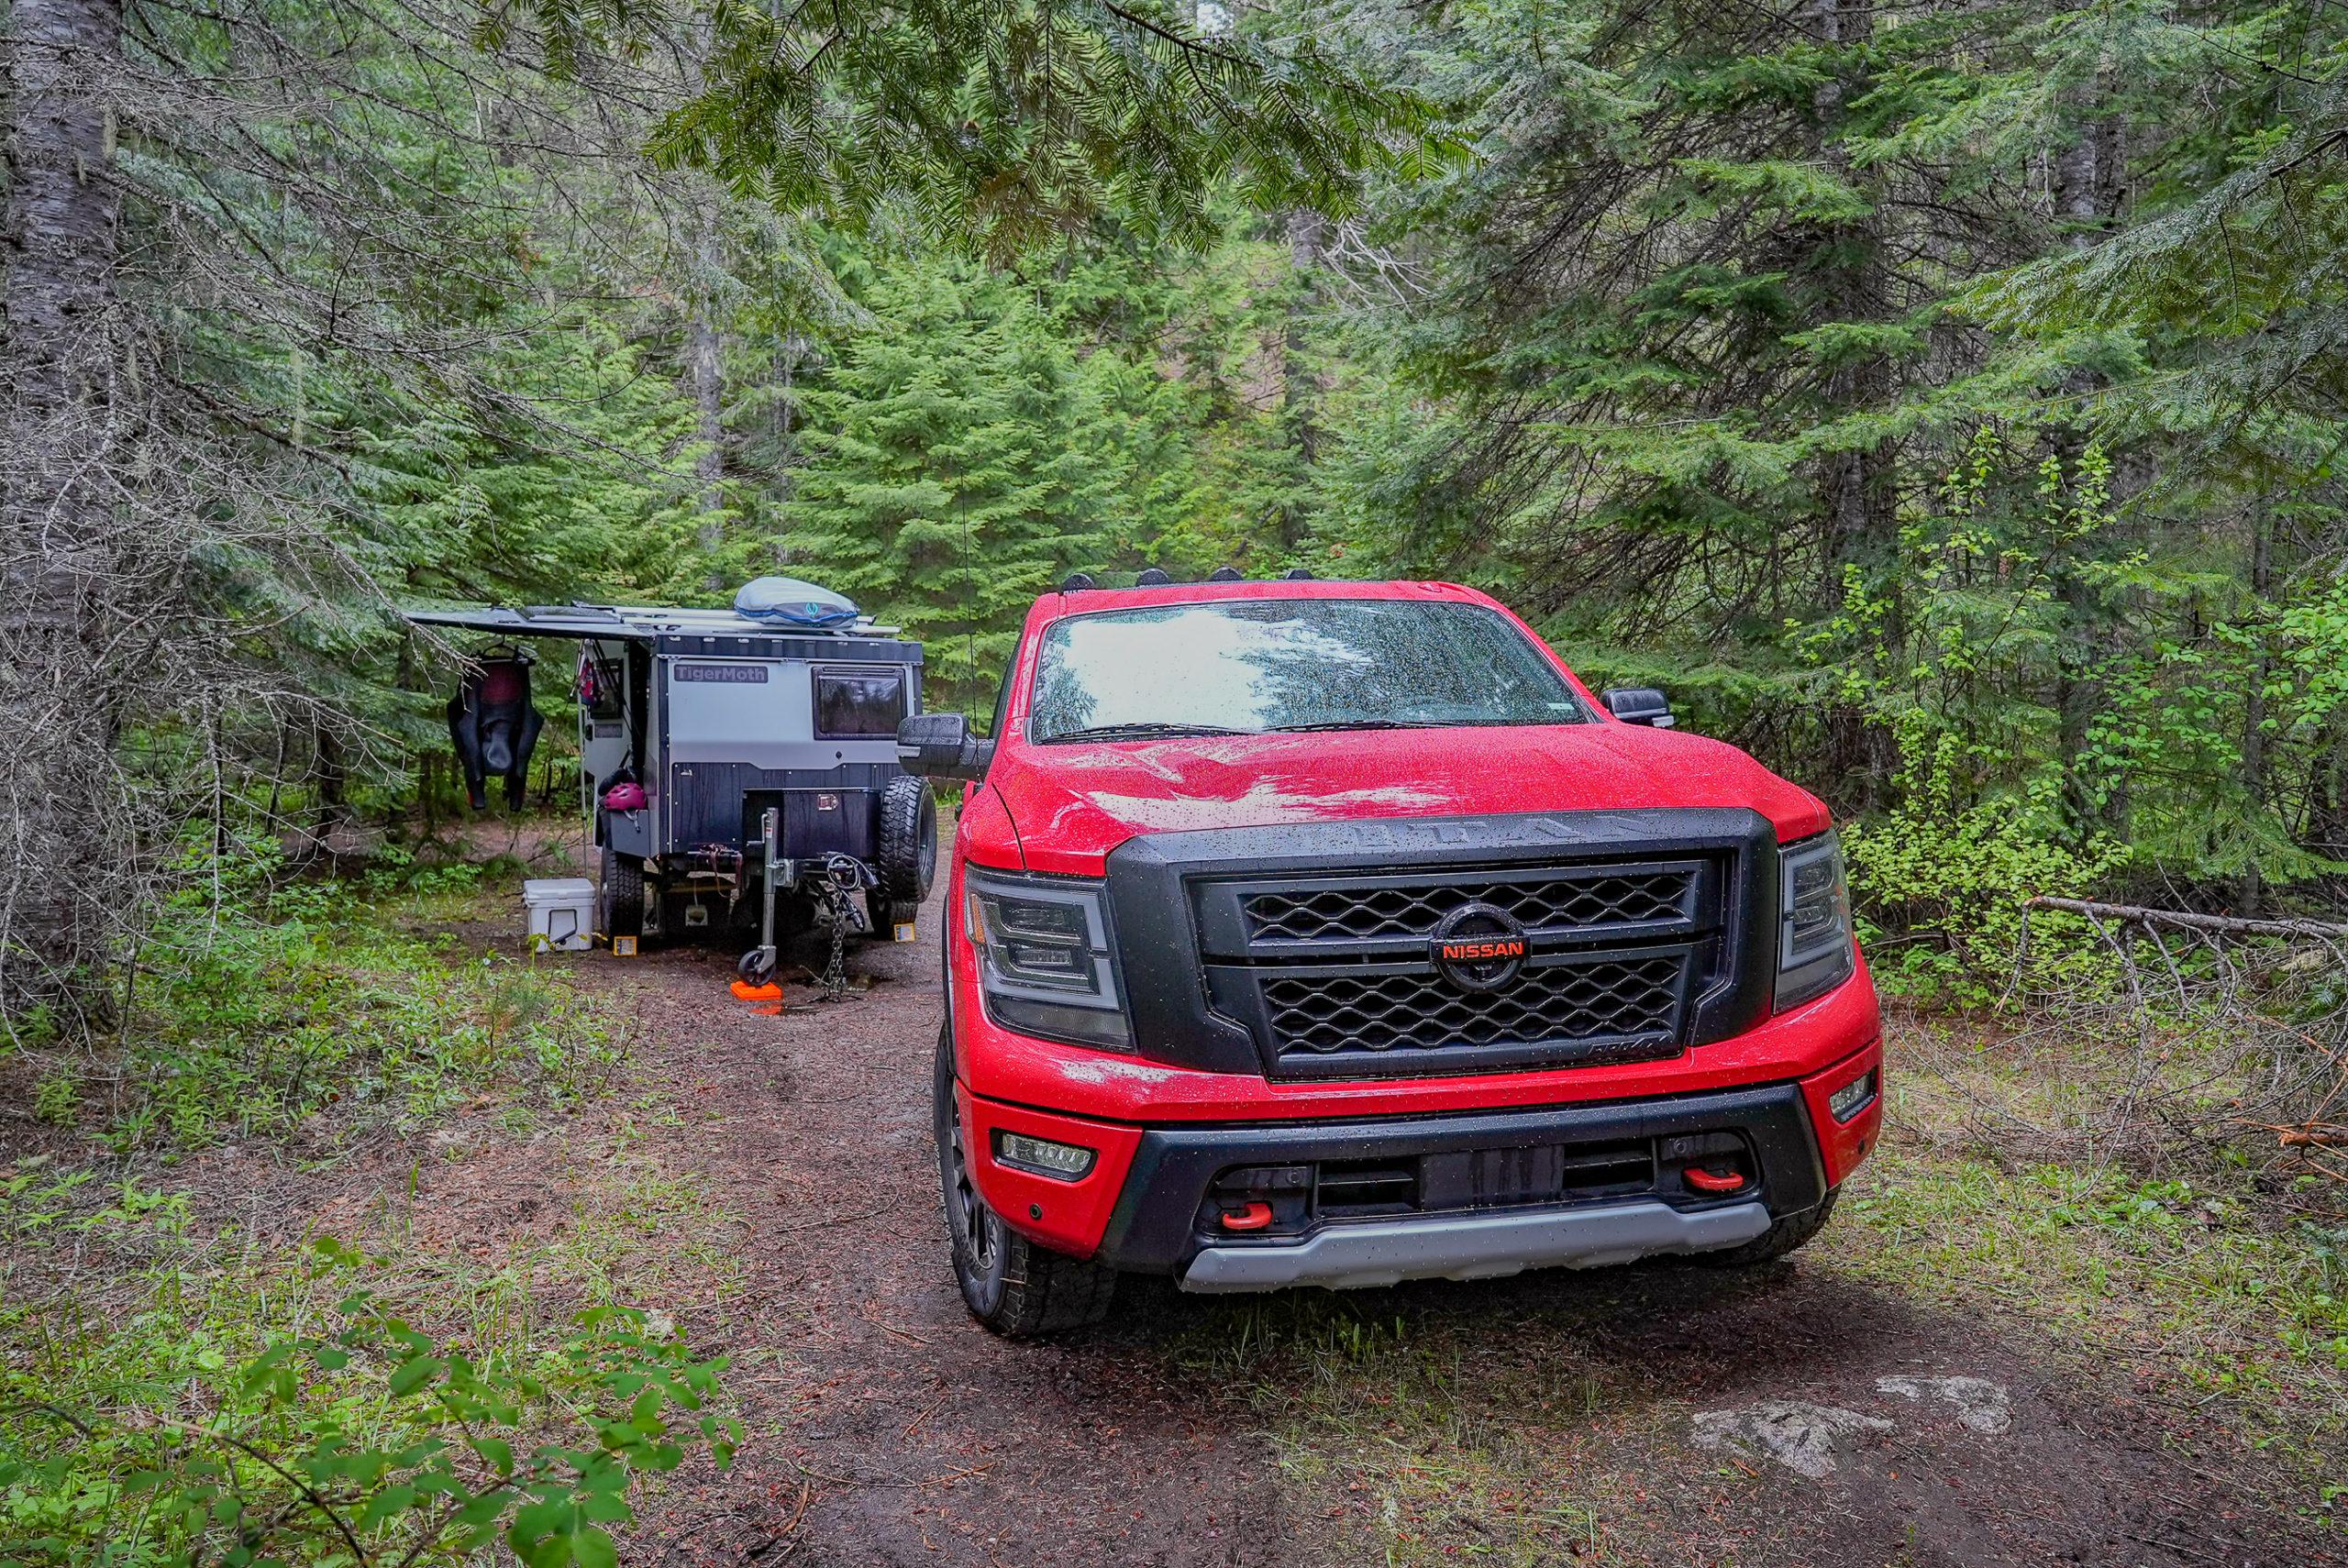 2021 Nissan Titan Pro-4X at campsite